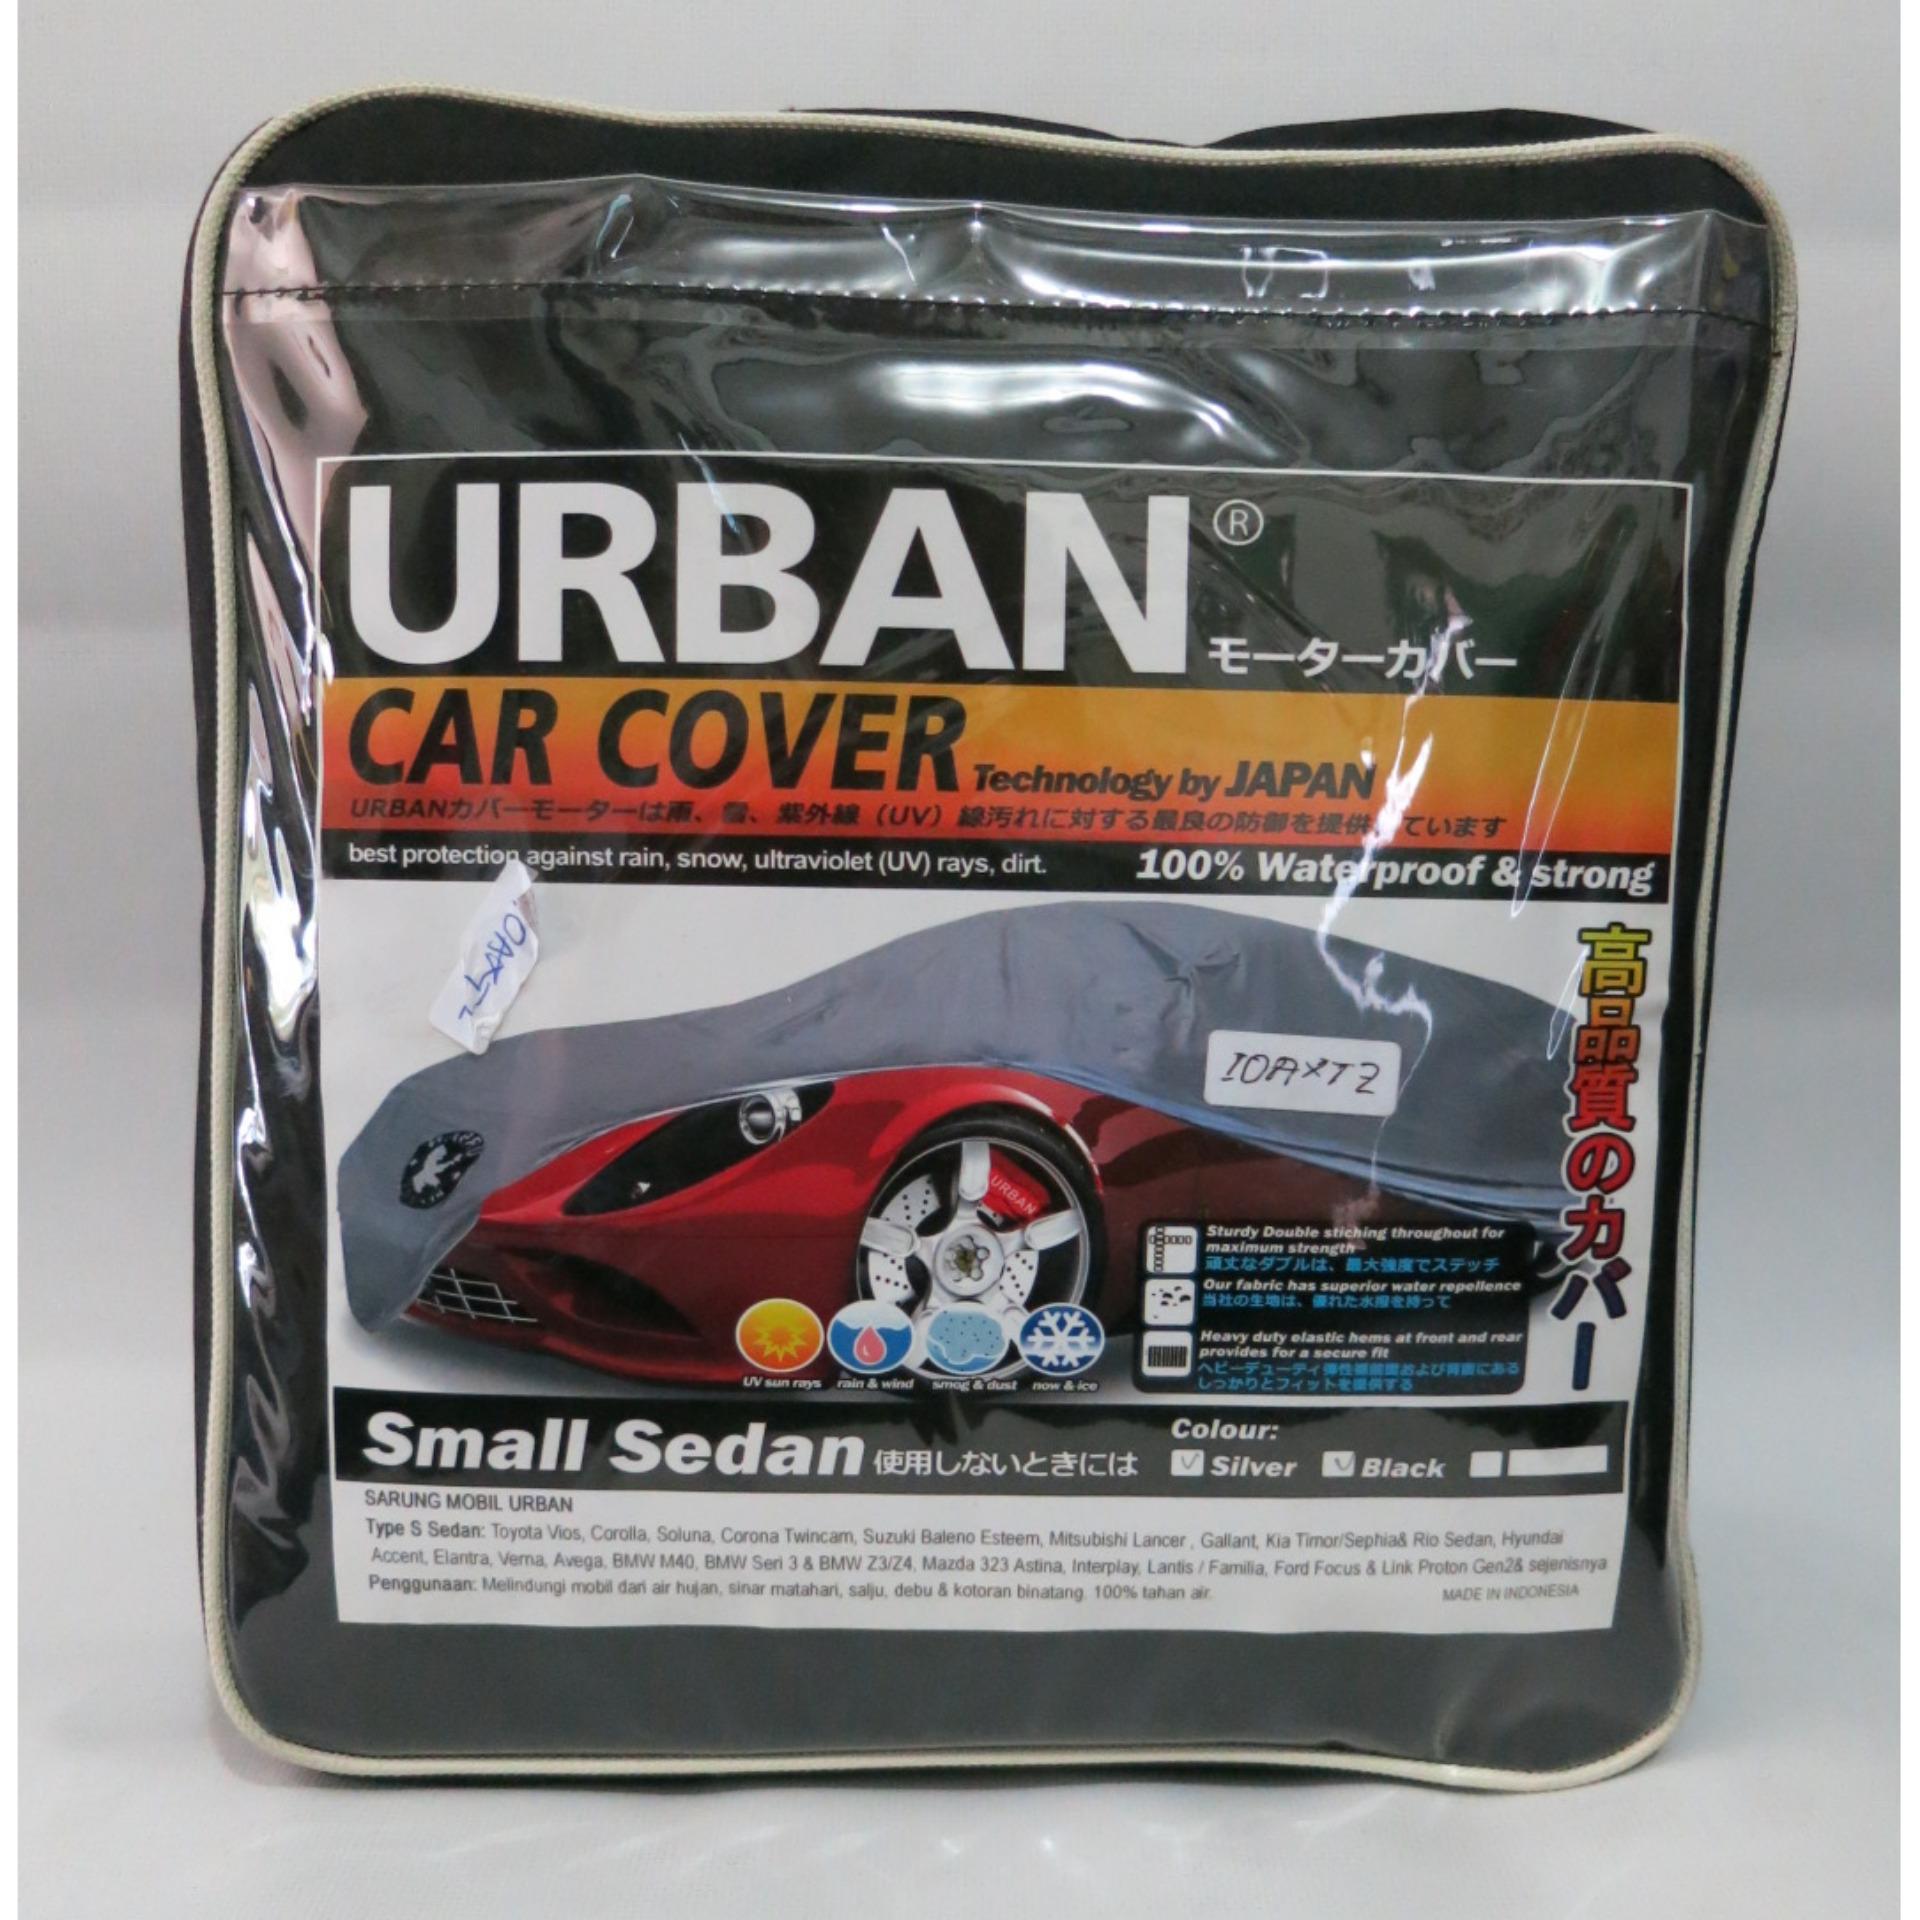 Urban Cover / Selimut / Sarung Mobil City Vios Soluna Baleno Small Sedan Waterproof